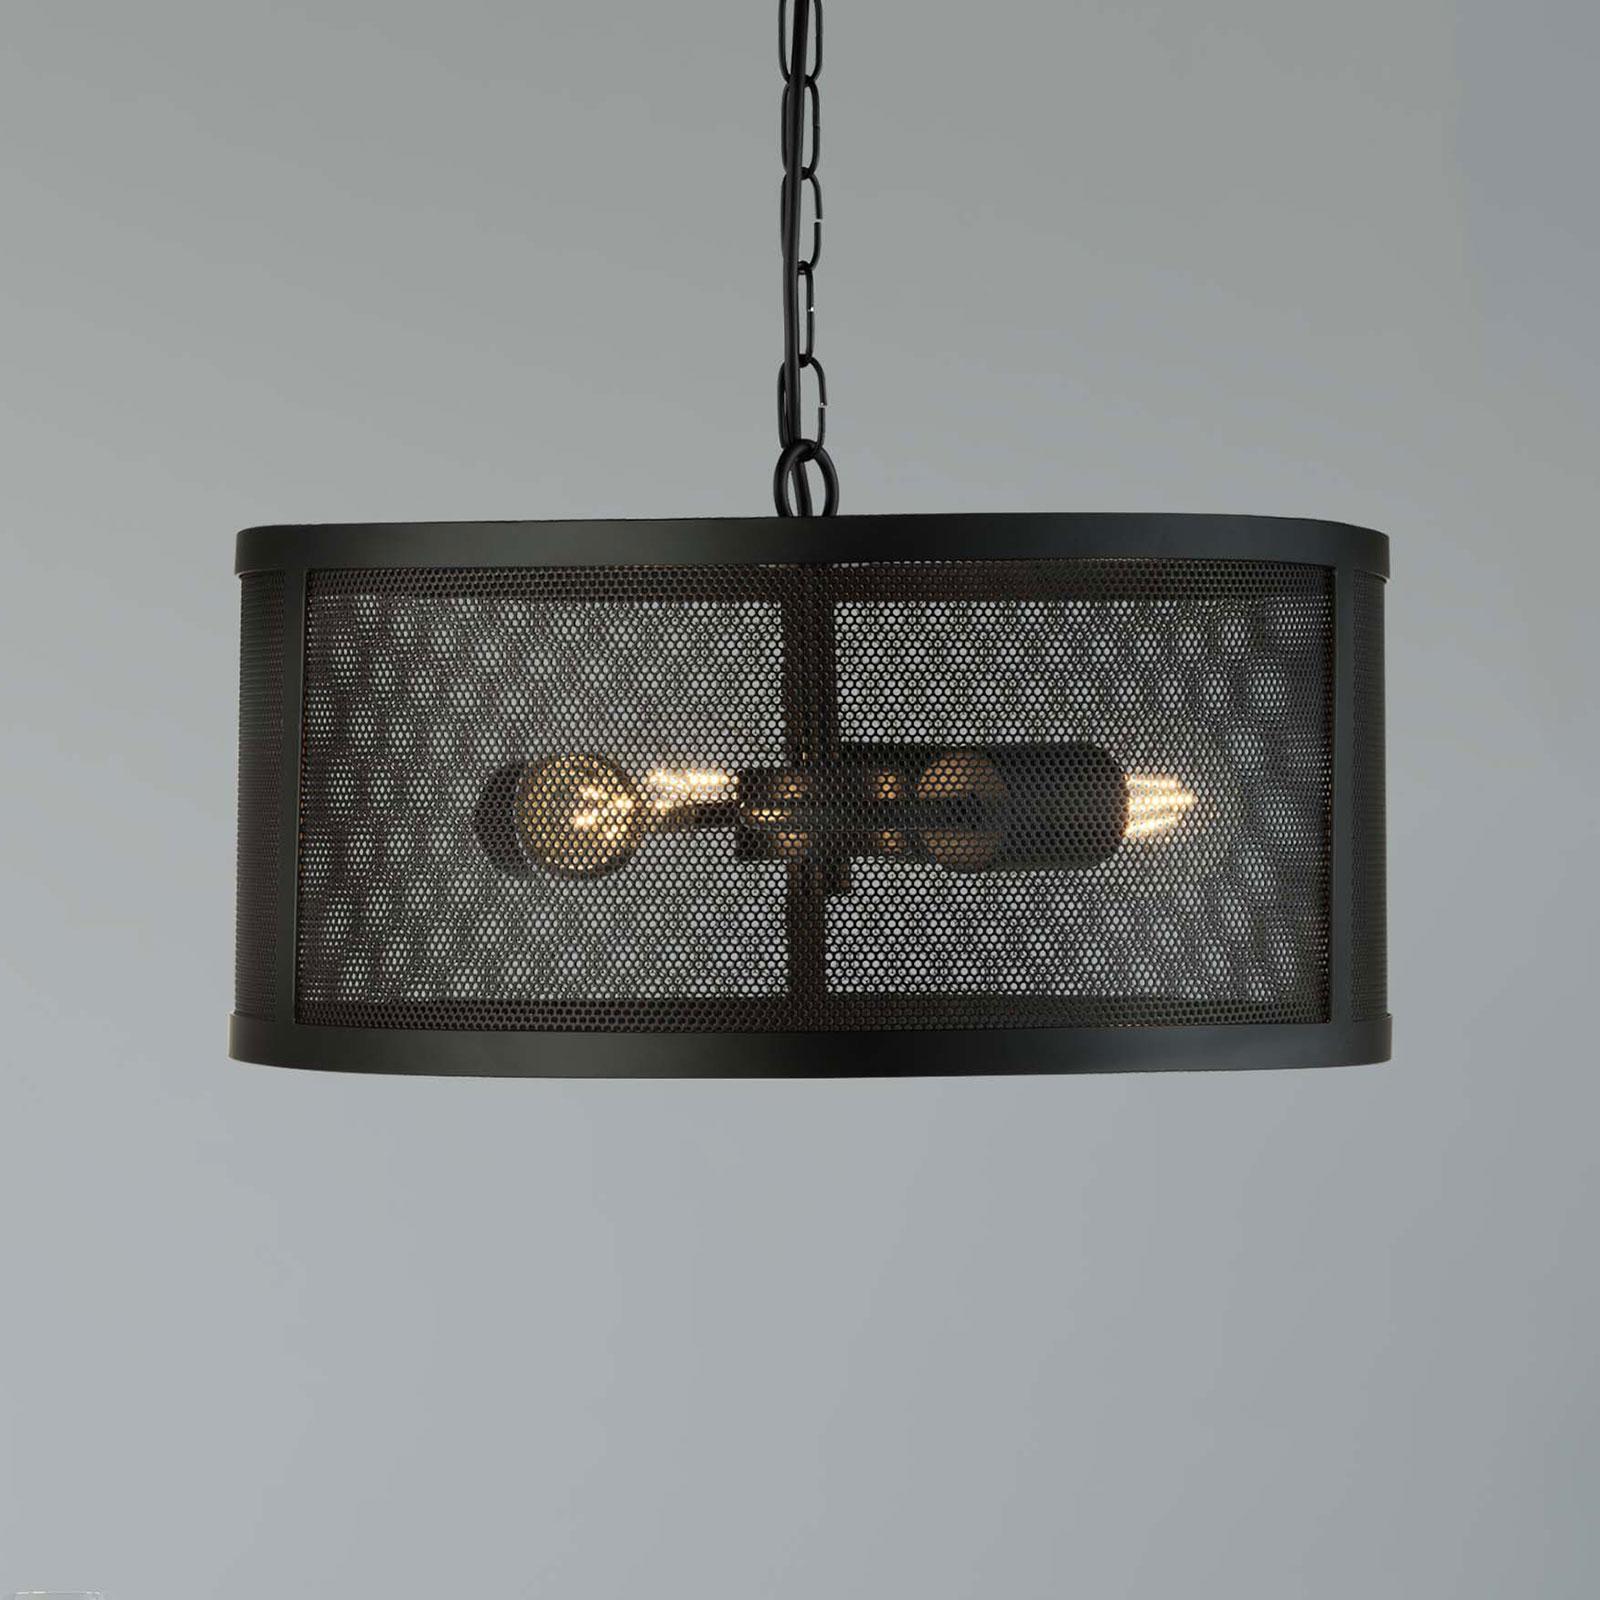 Lampa wisząca Fishnet z metalu czarna Ø 45 cm